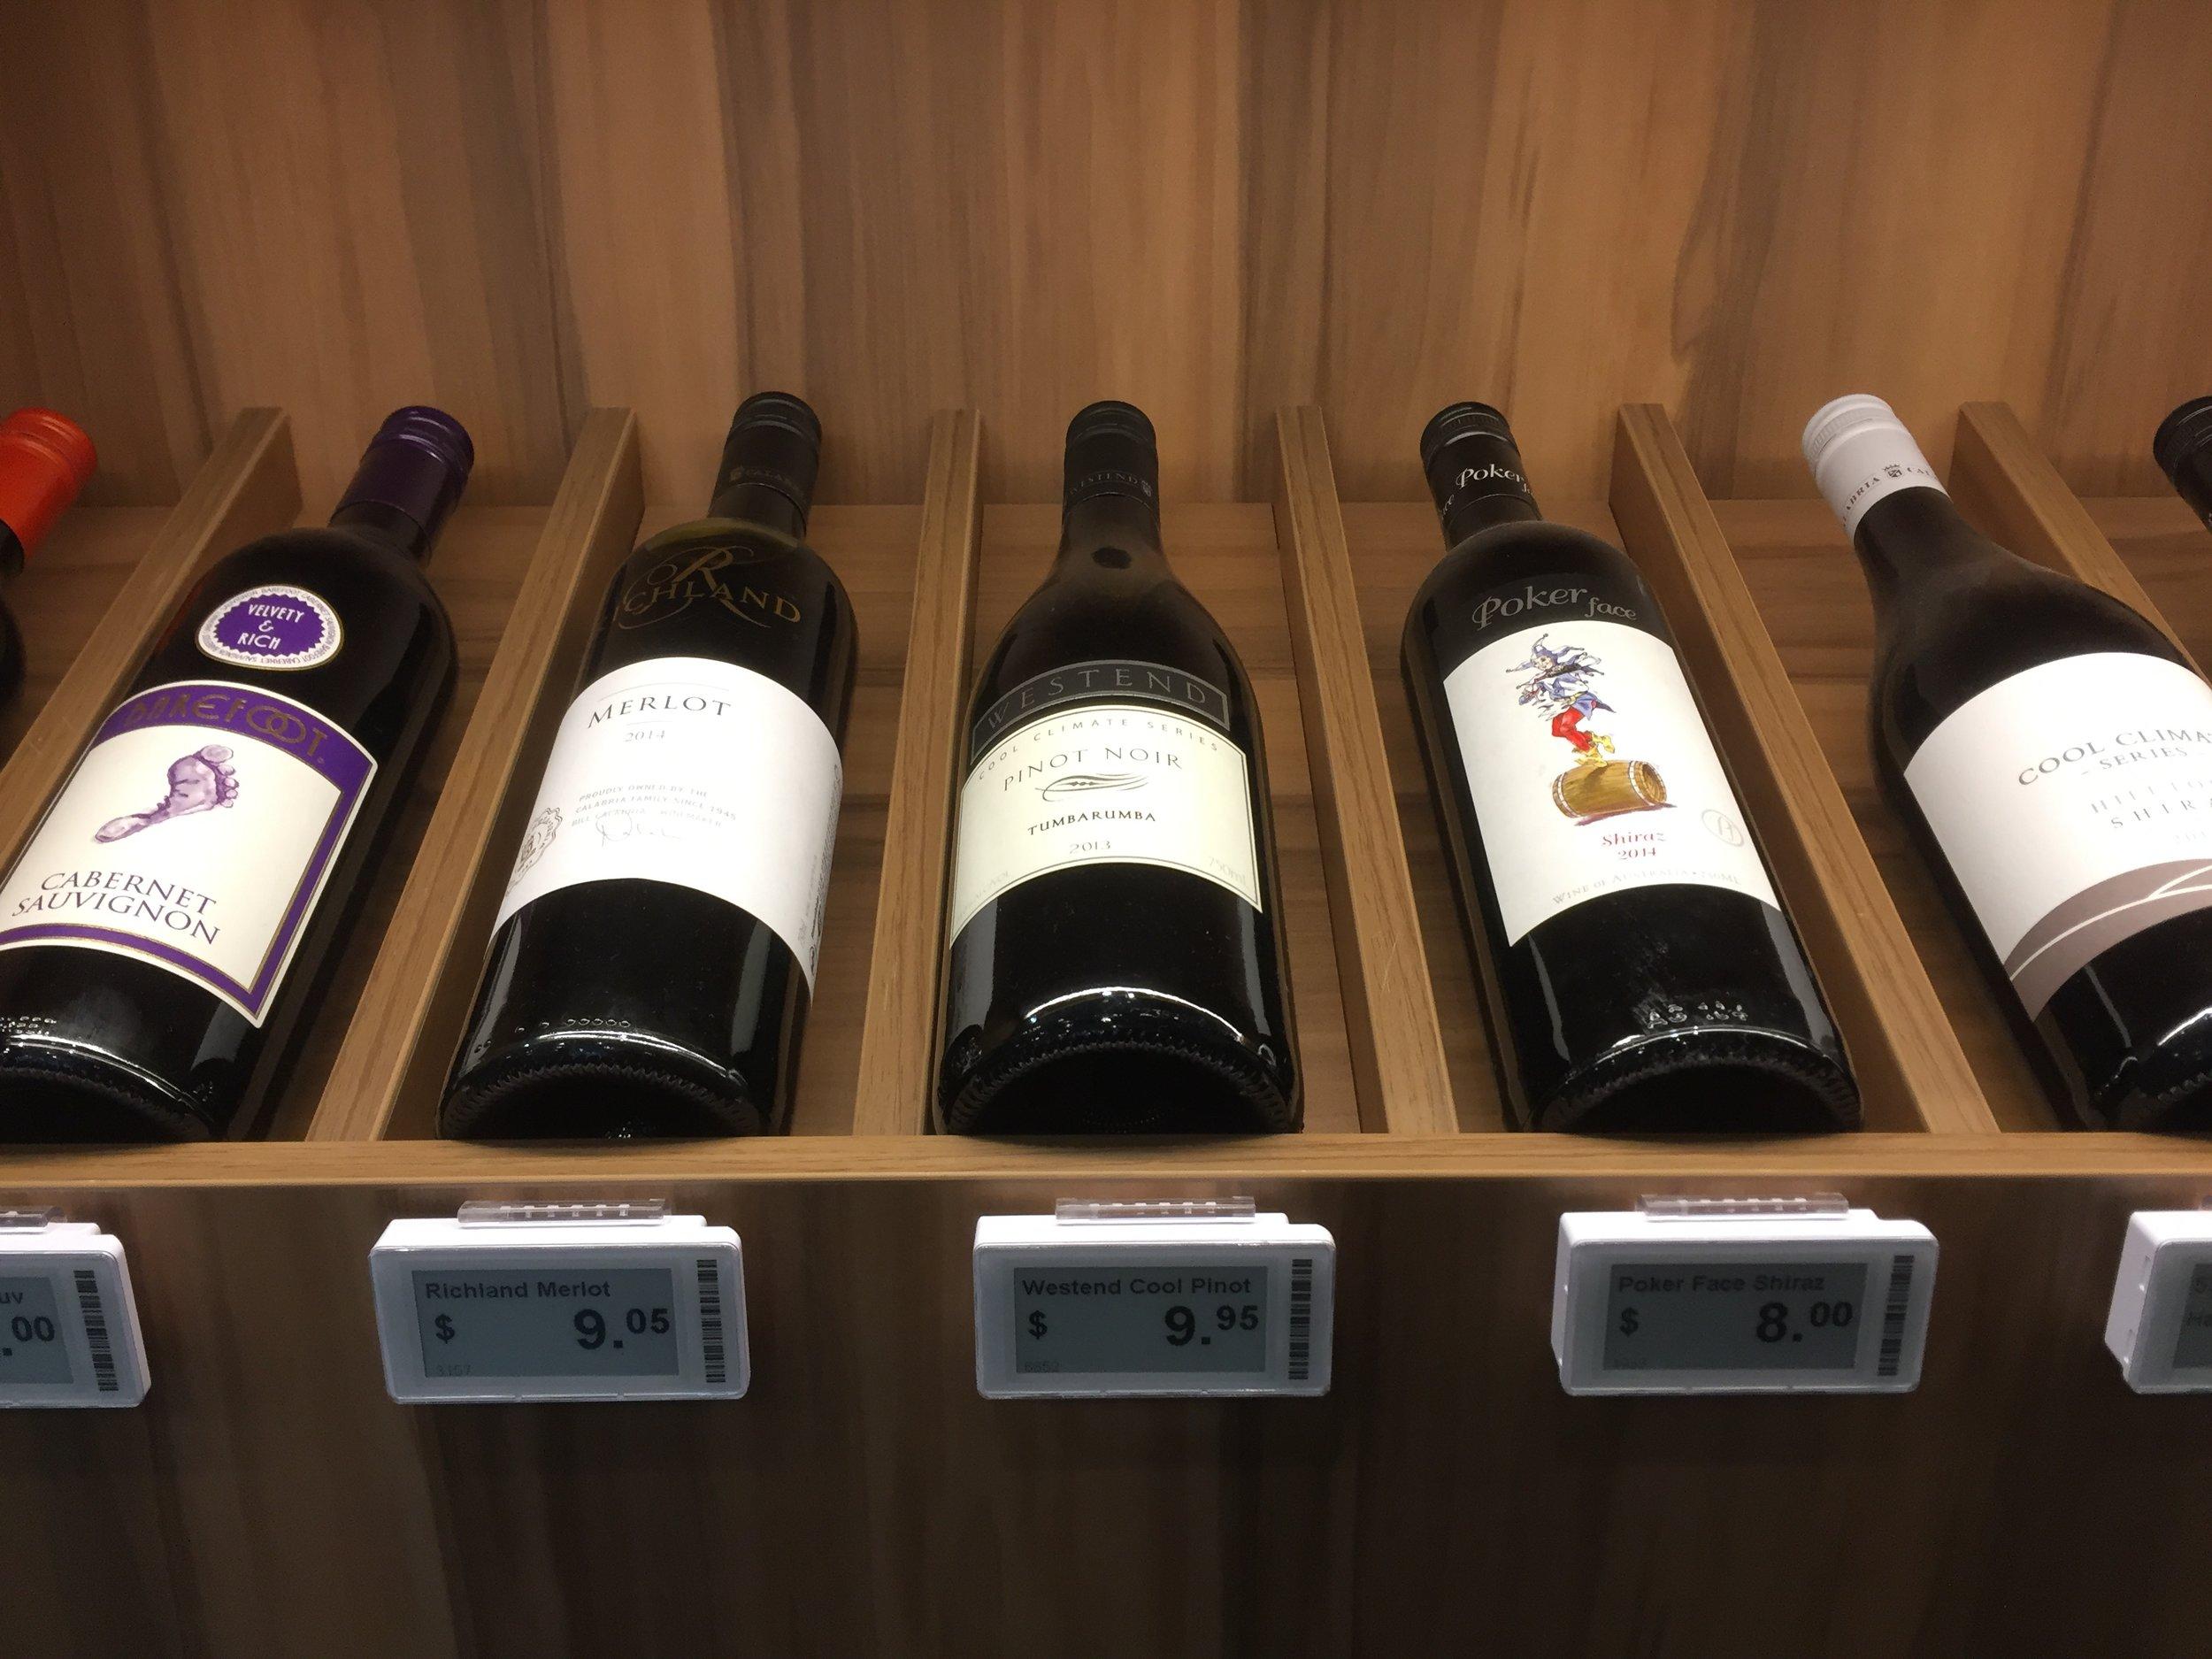 Sydney bottle shop red wine display with ESLs